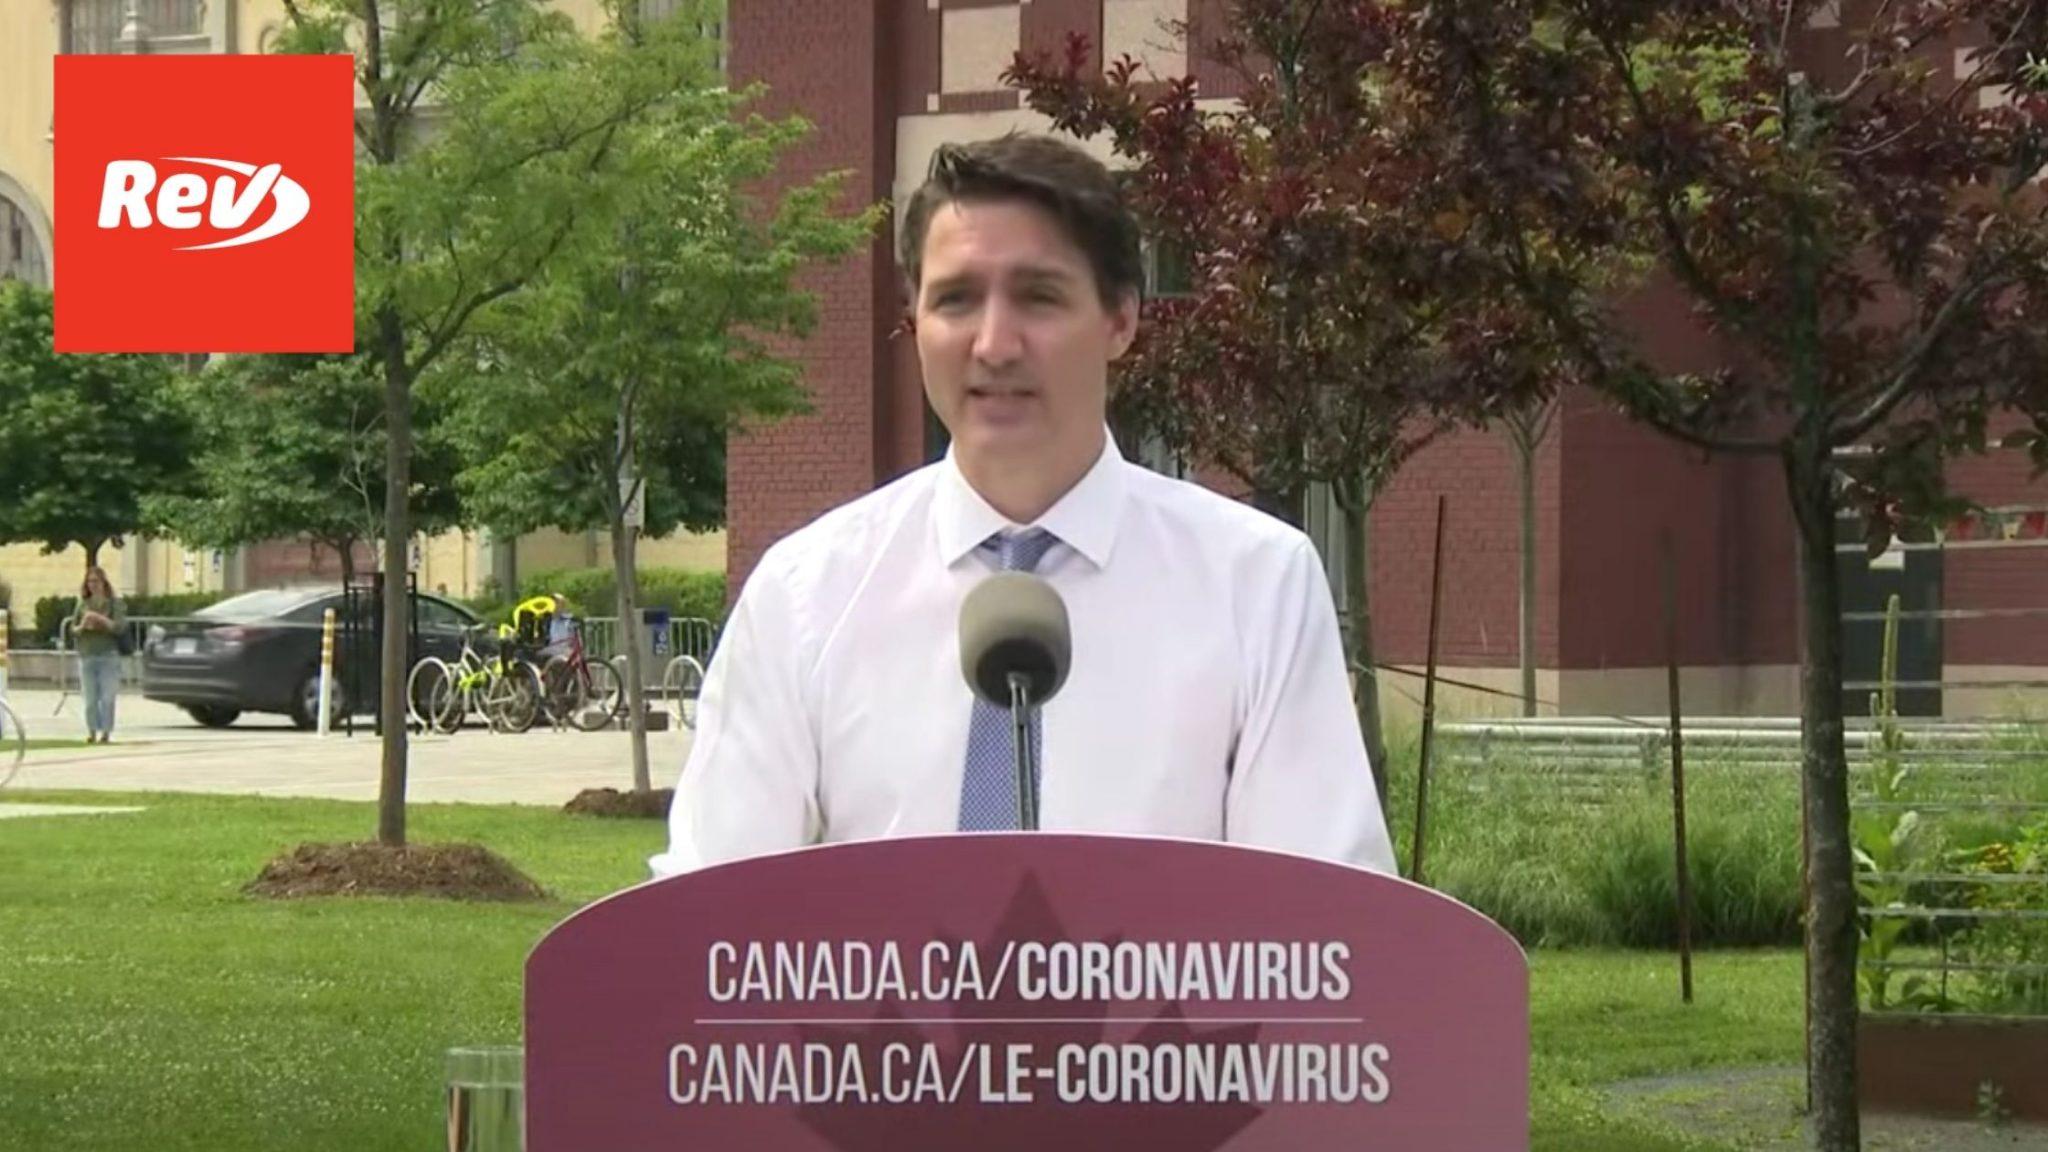 Justin Trudeau Canada Heat Wave Press Conference Transcript